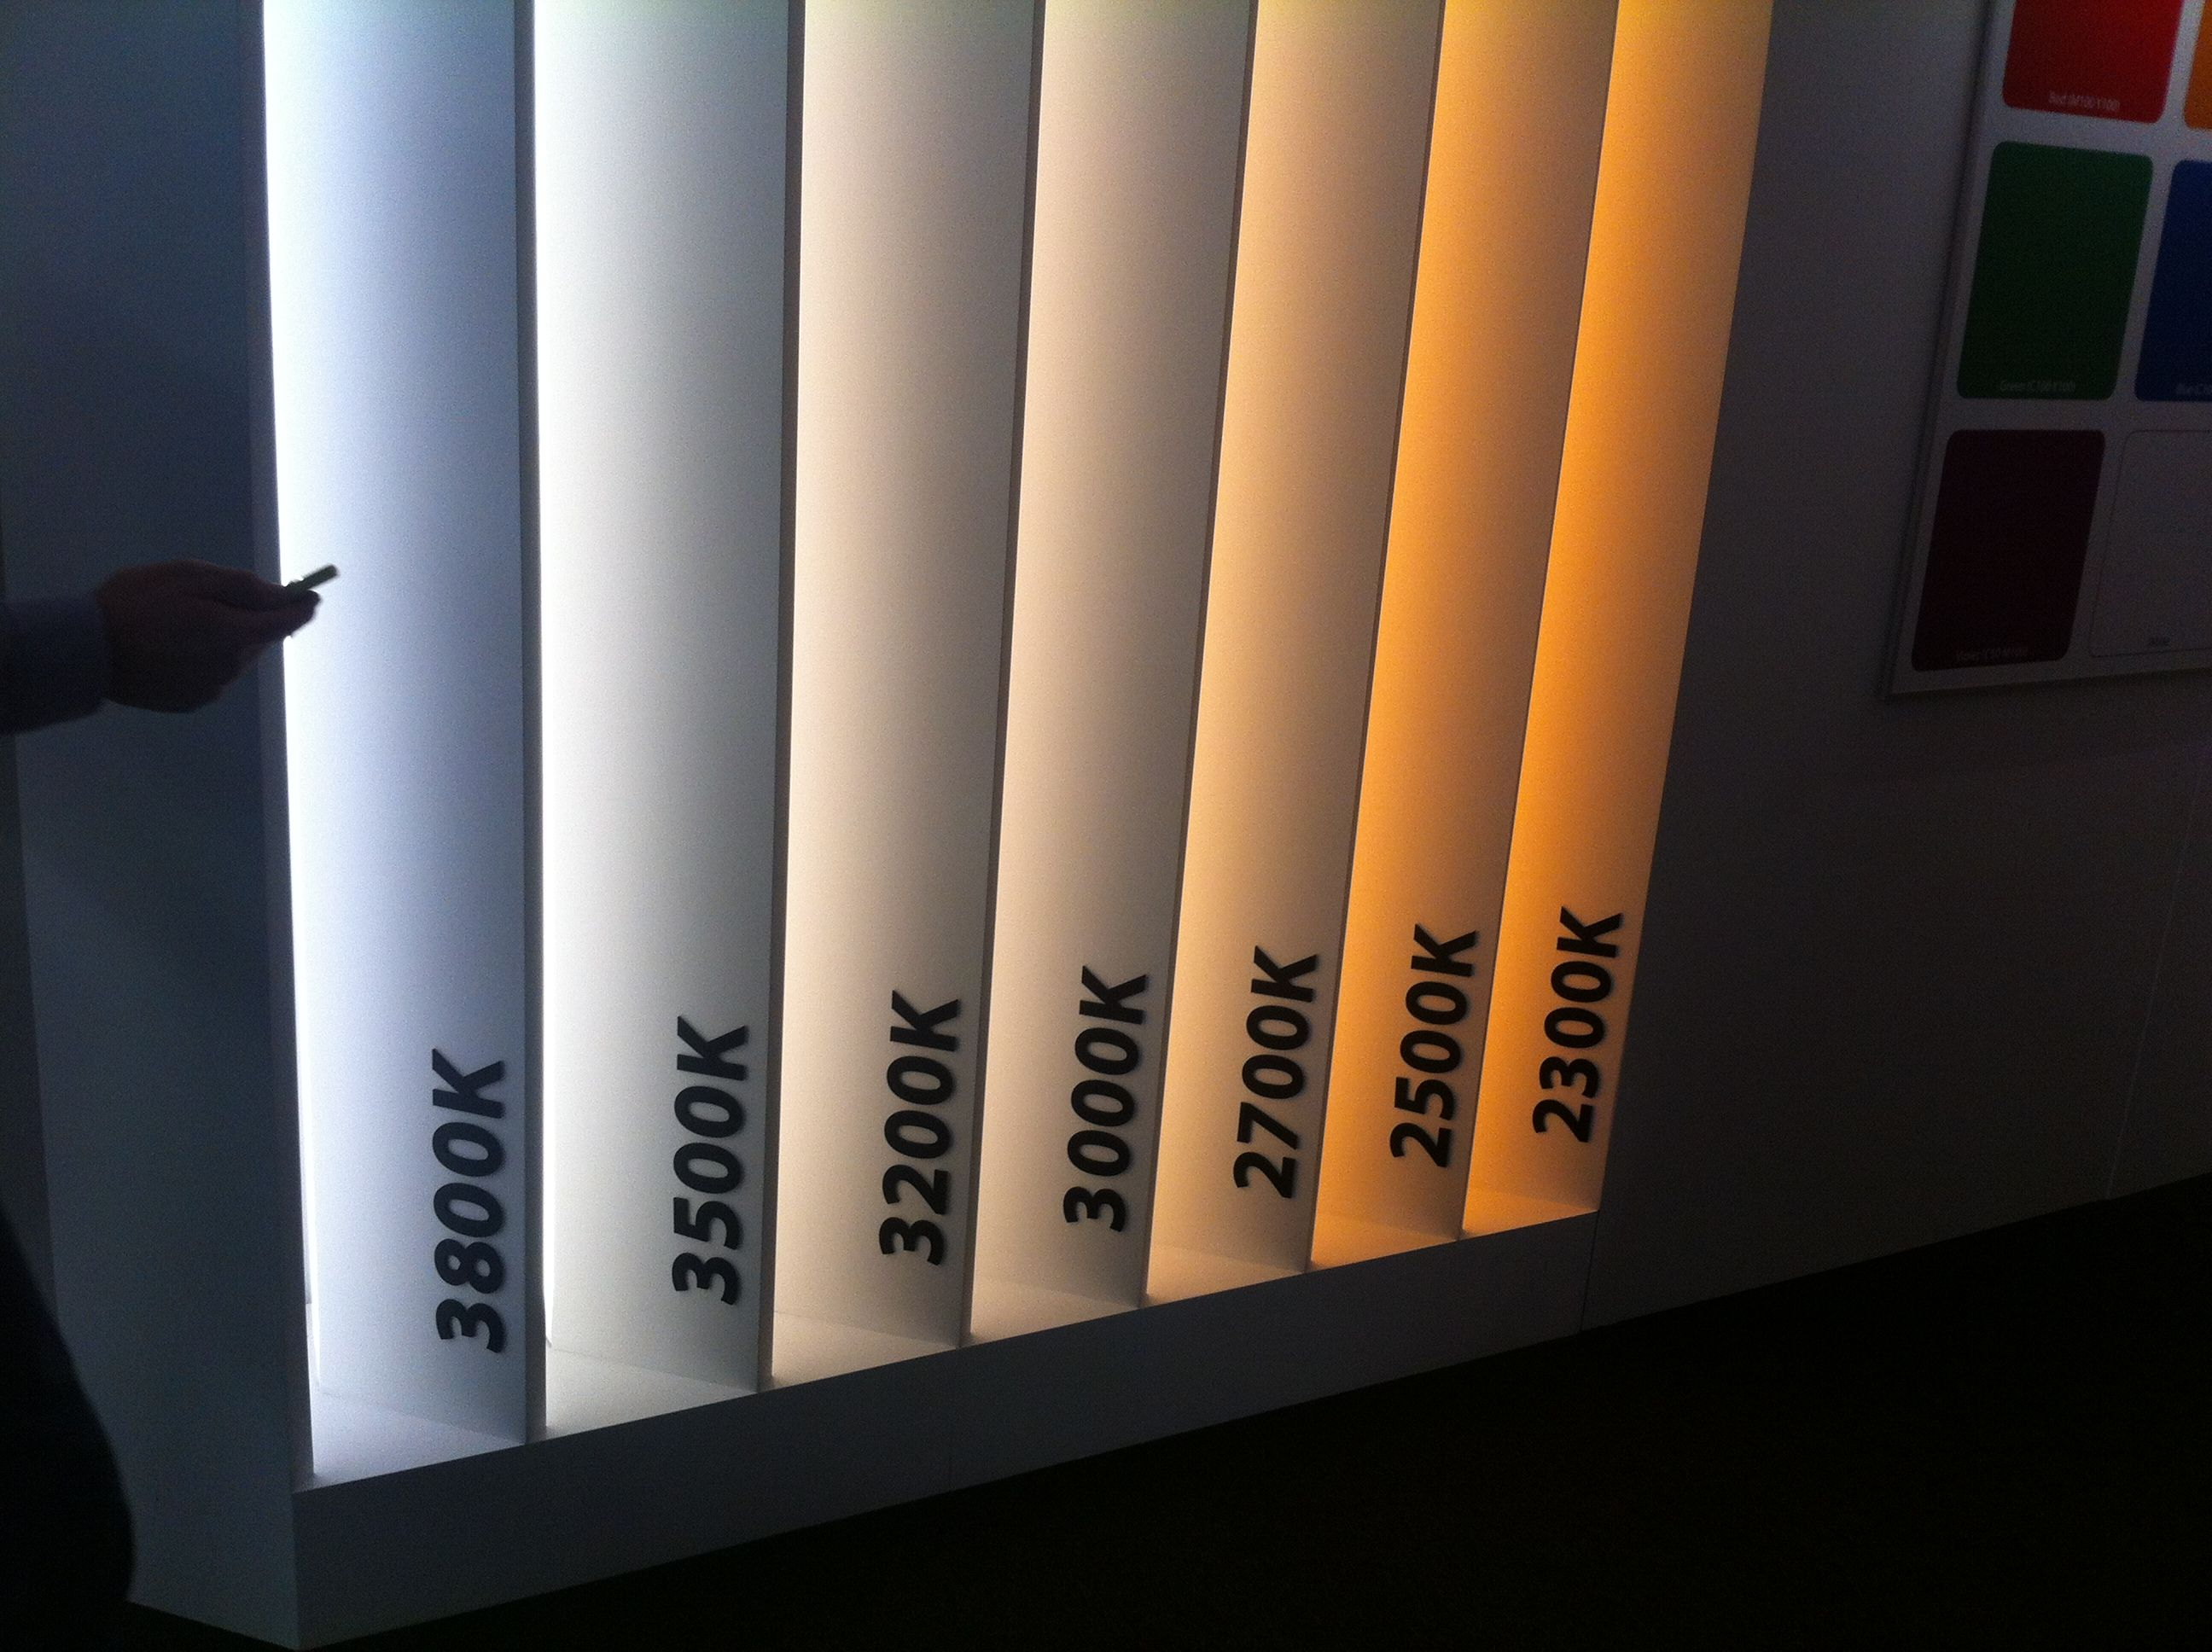 Lighting Colour Temperature KKDC L I G H T I N D E T A